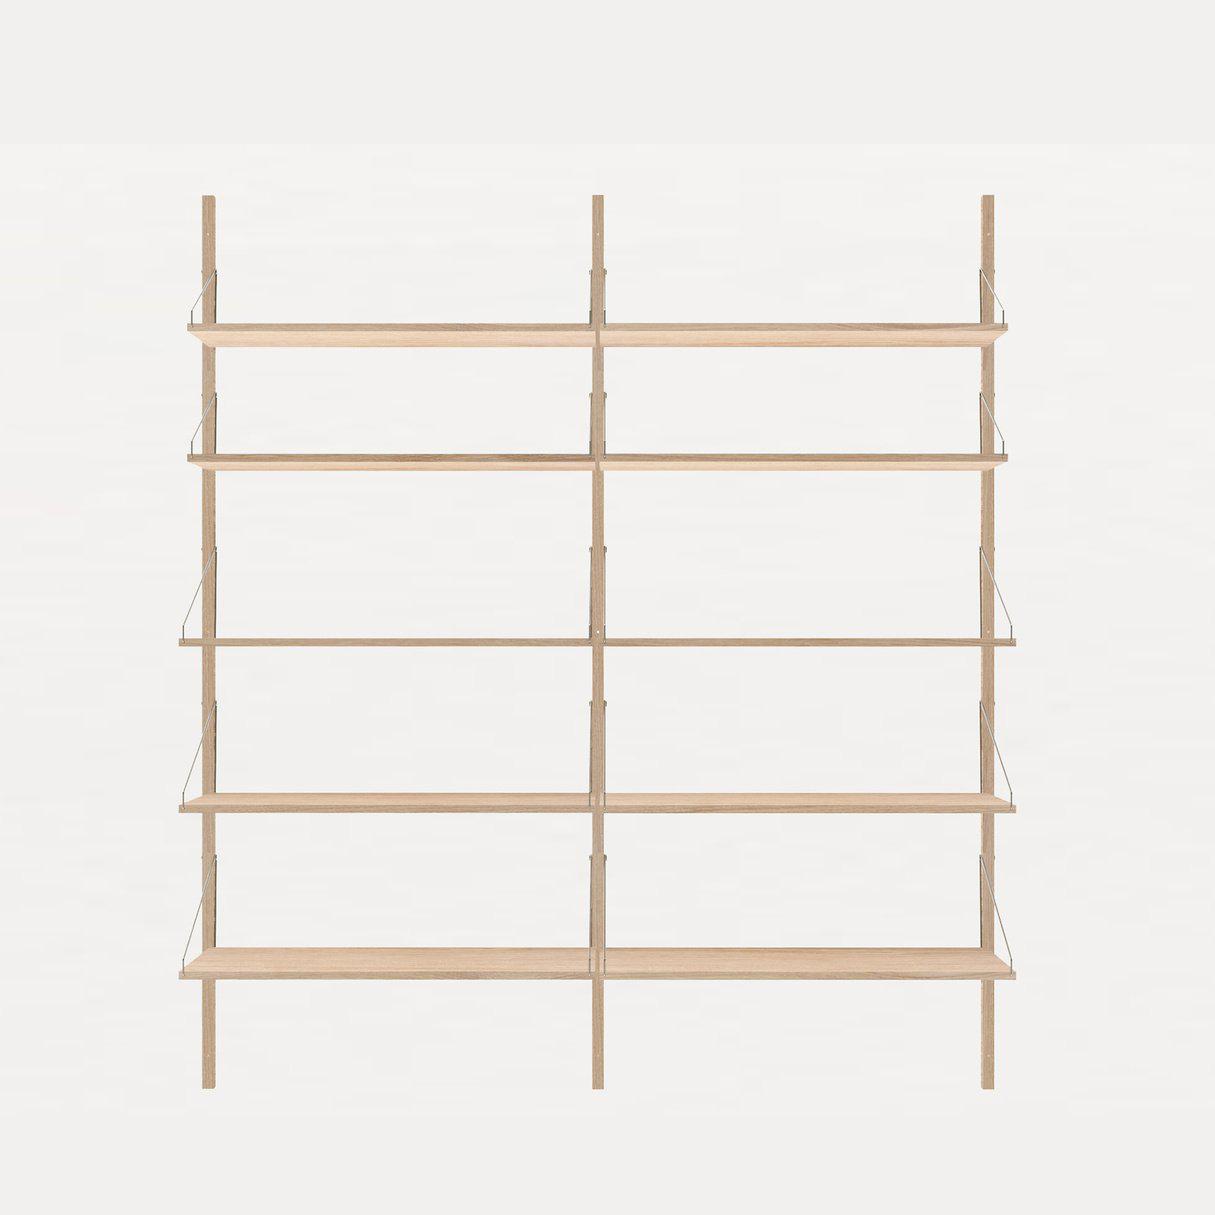 Frama Shelf Library White Oak H1852 / Double section